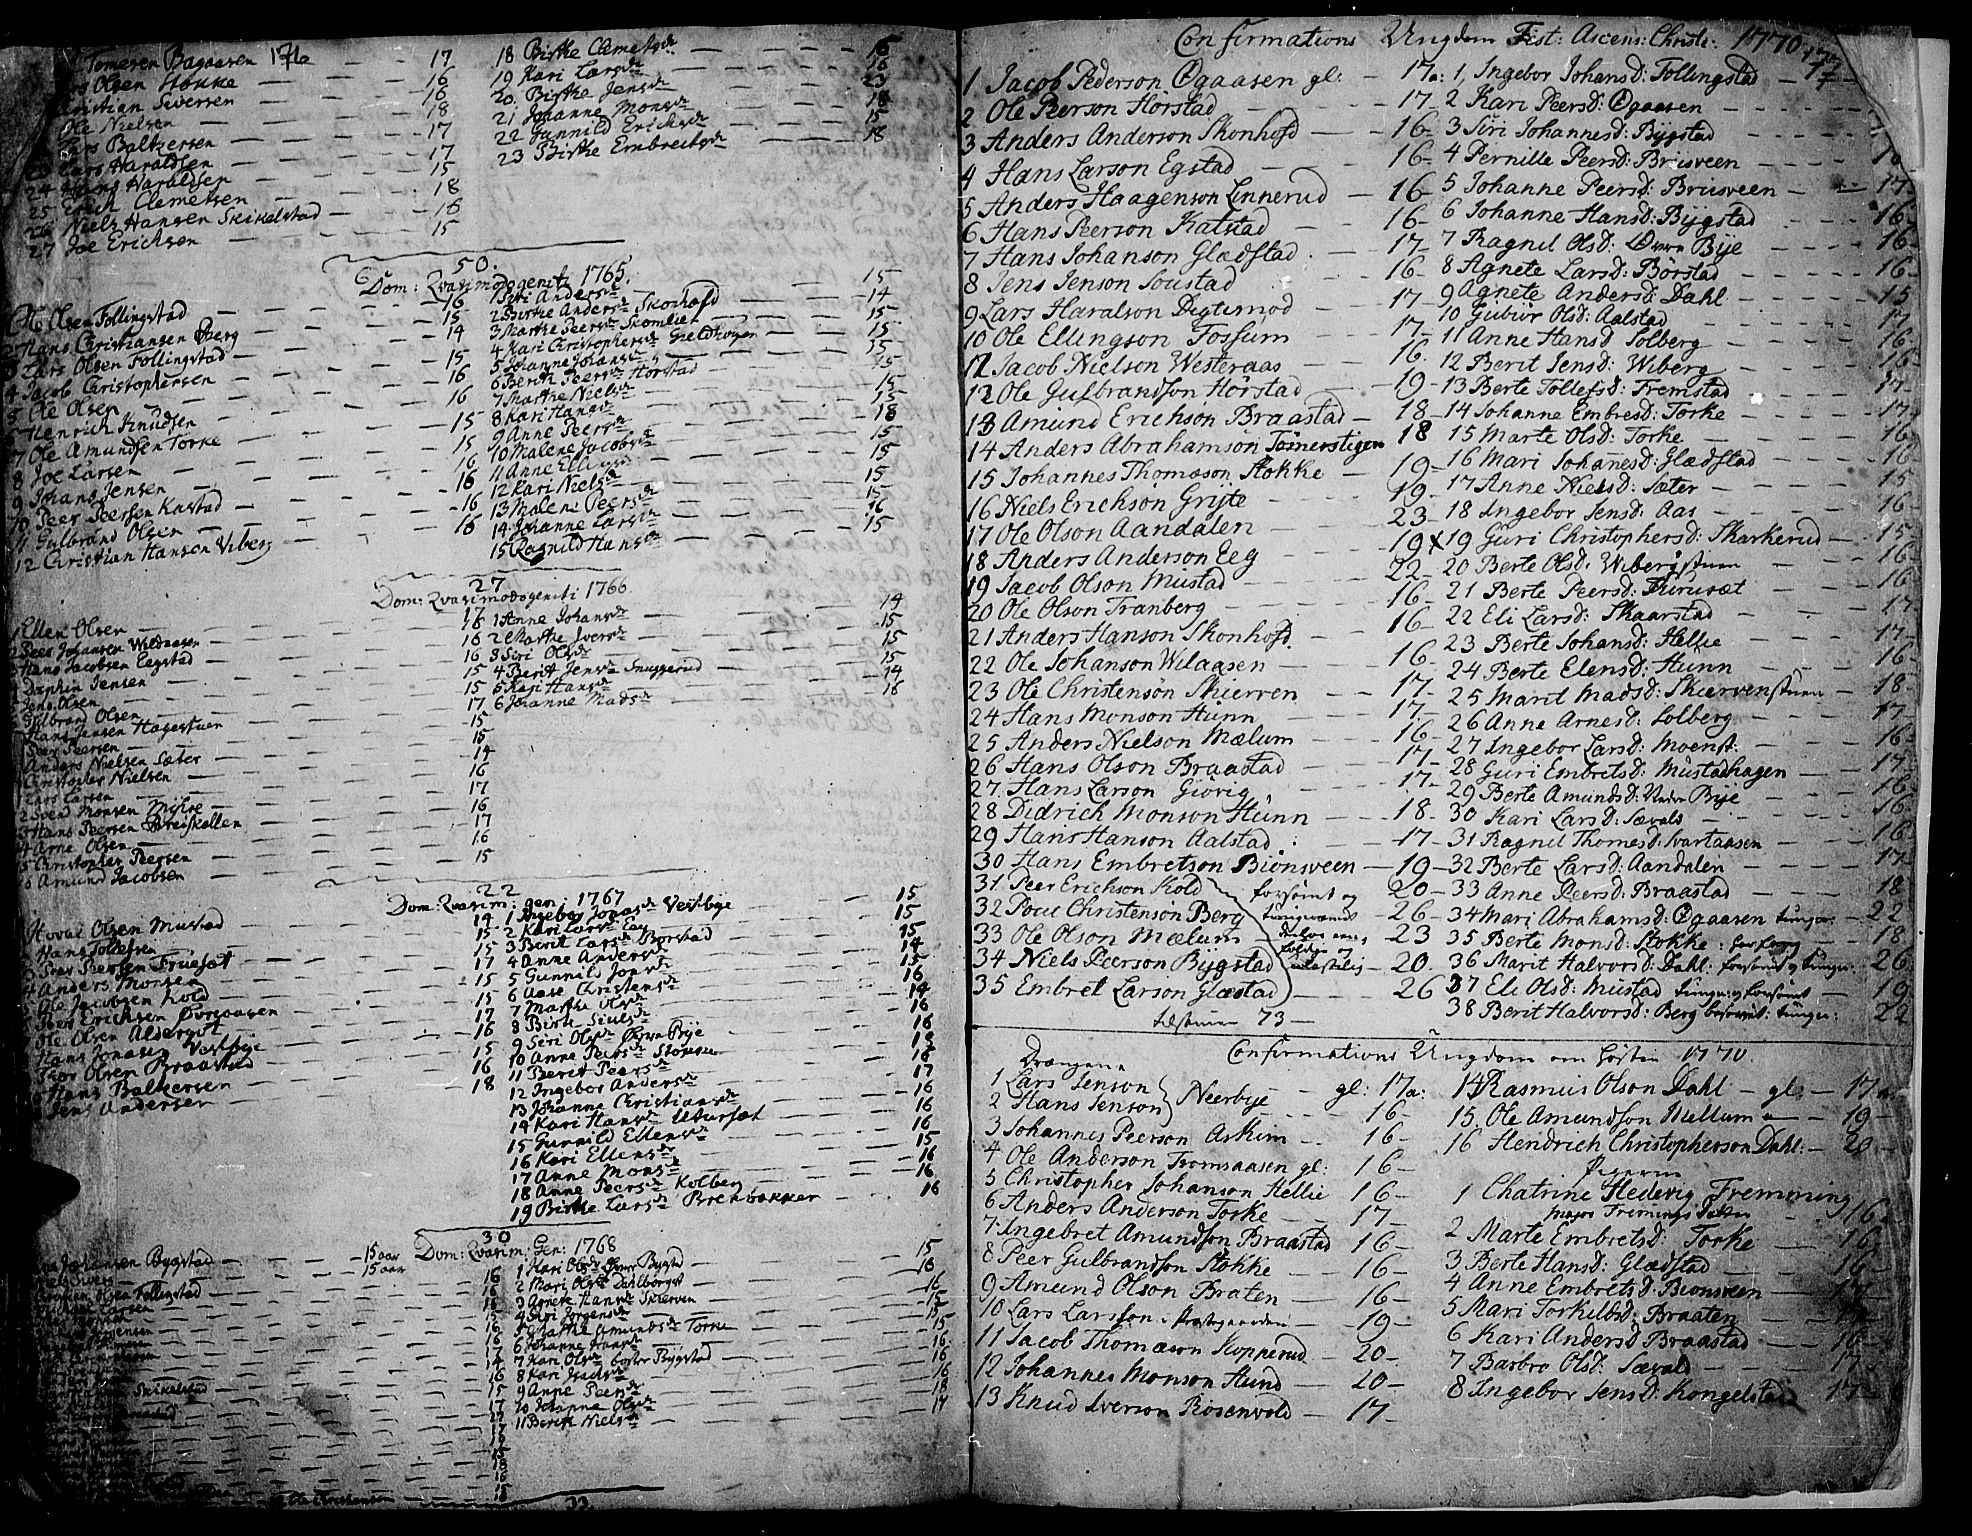 SAH, Vardal prestekontor, H/Ha/Haa/L0002: Ministerialbok nr. 2, 1748-1776, s. 176-177